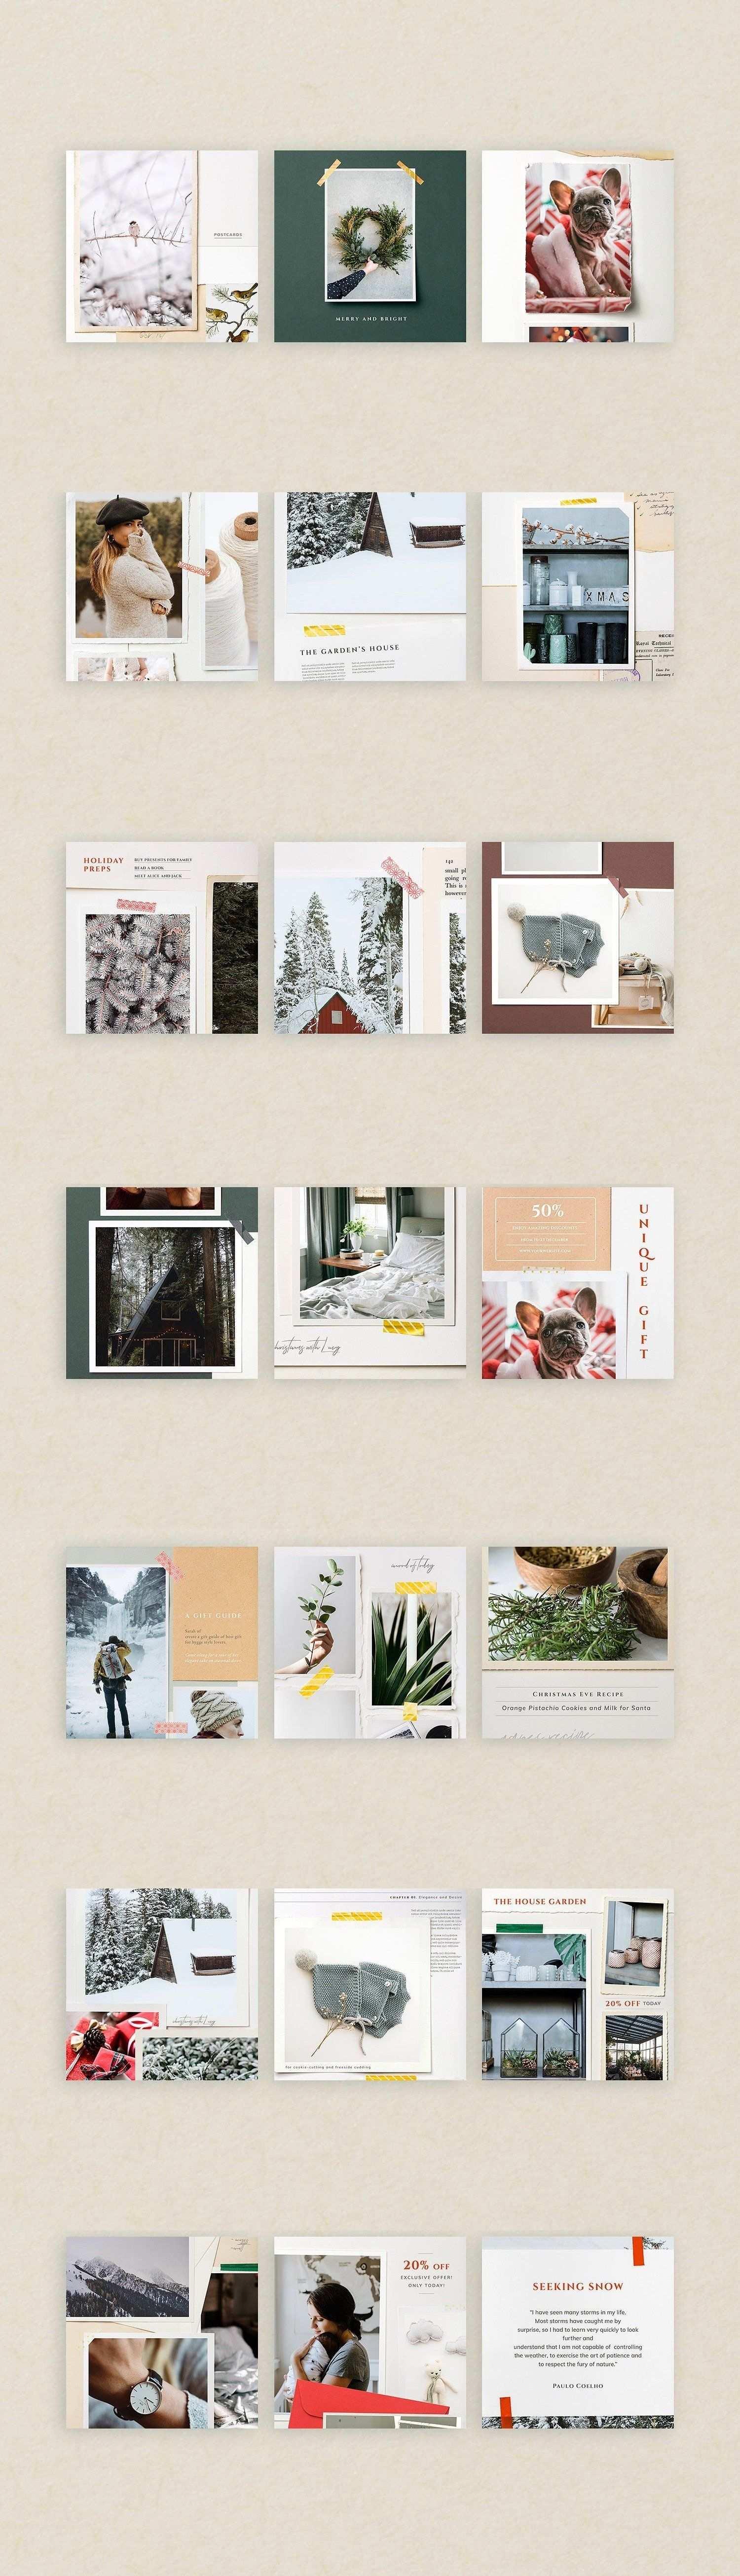 Canva Bundle Social Kit Free Instagram Photoshop Landscape Instagram Story Template